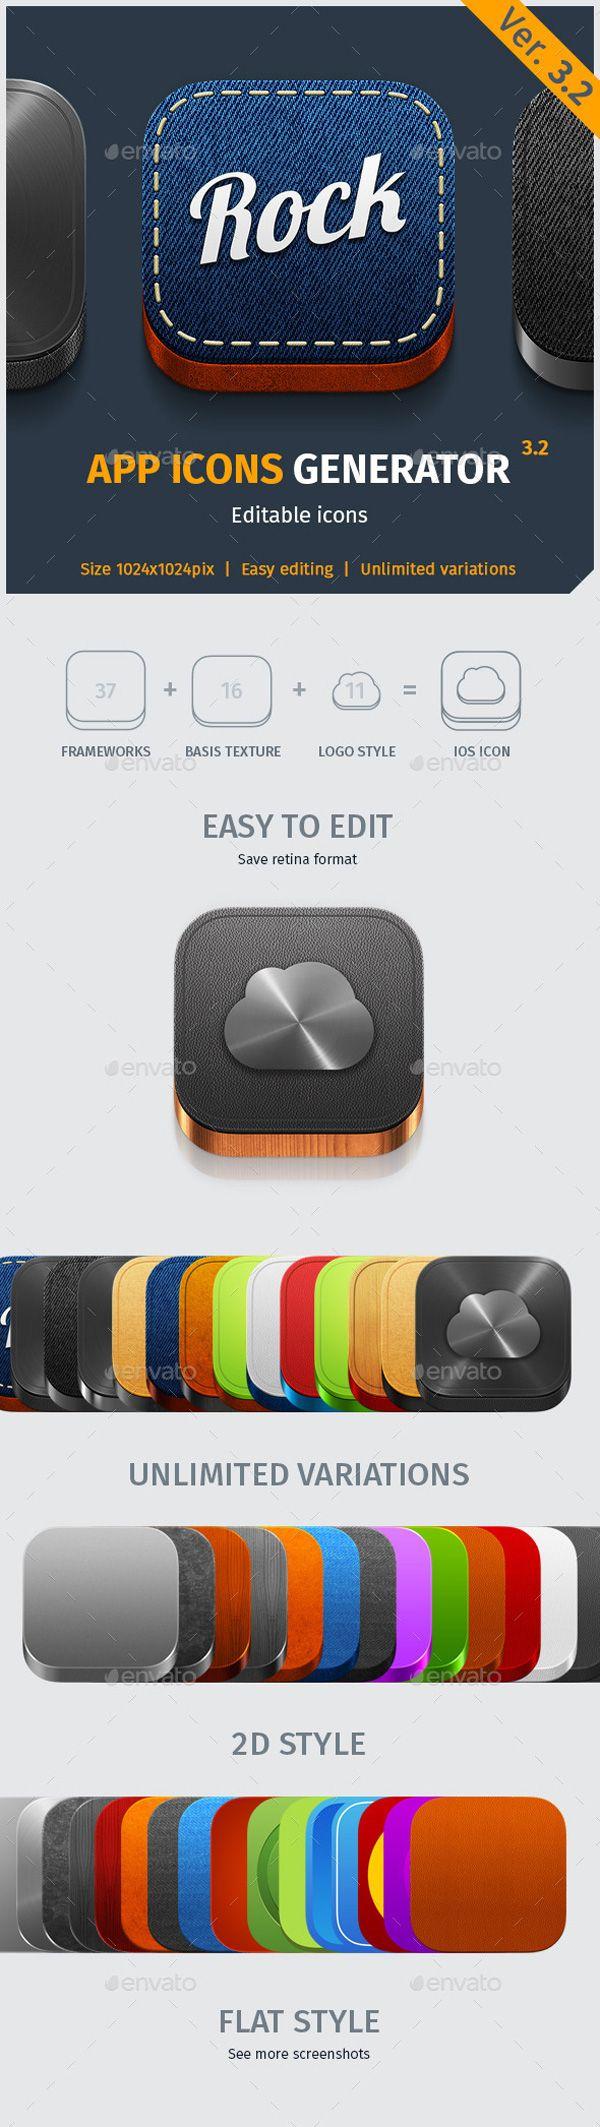 App Icon Generator (FREE) Icon generator, Android app